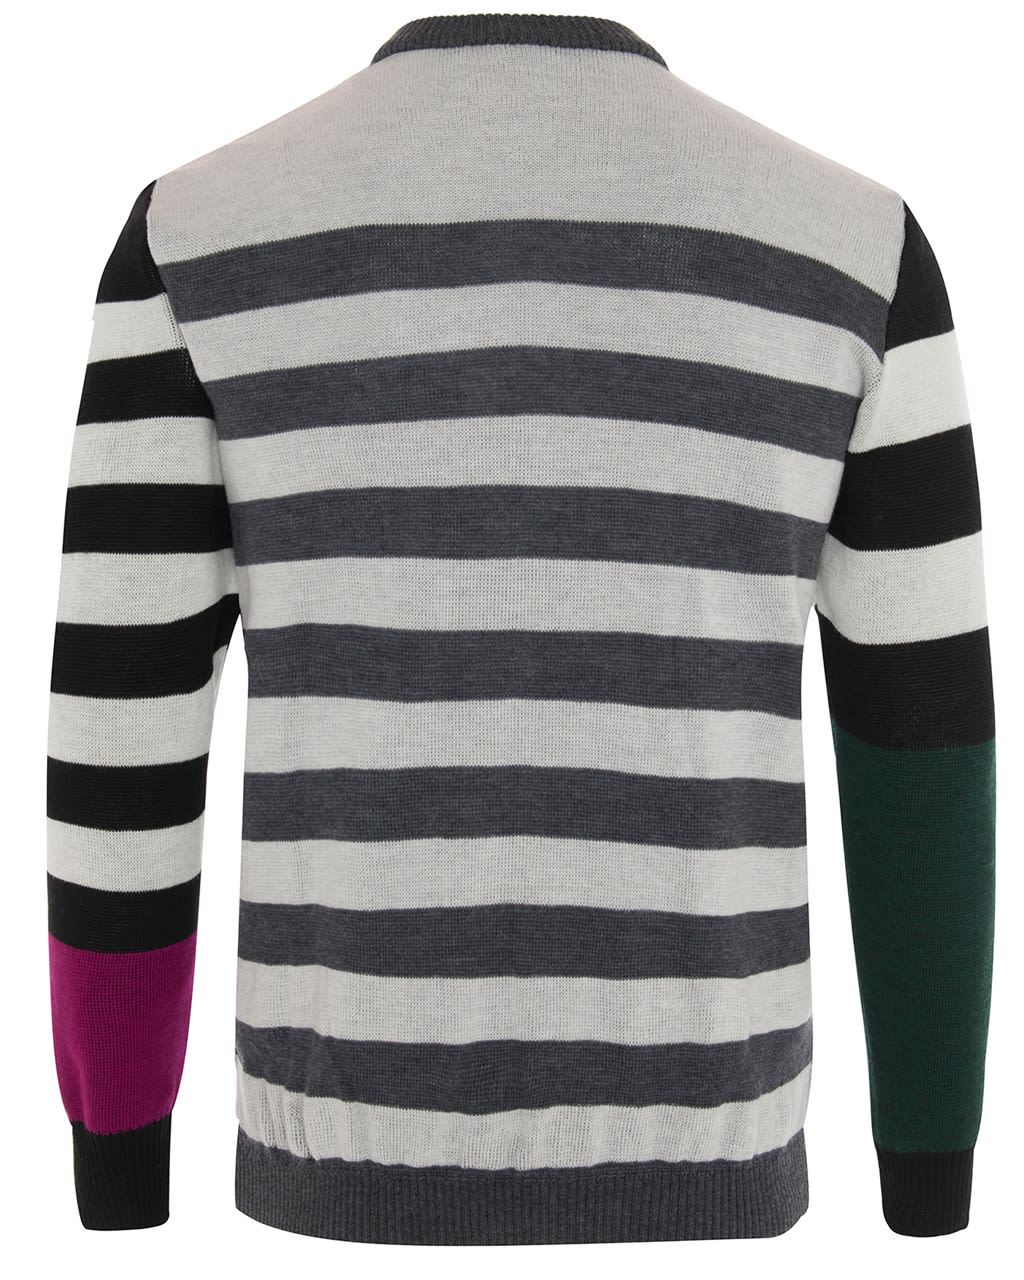 Colour Block Striped Jumper